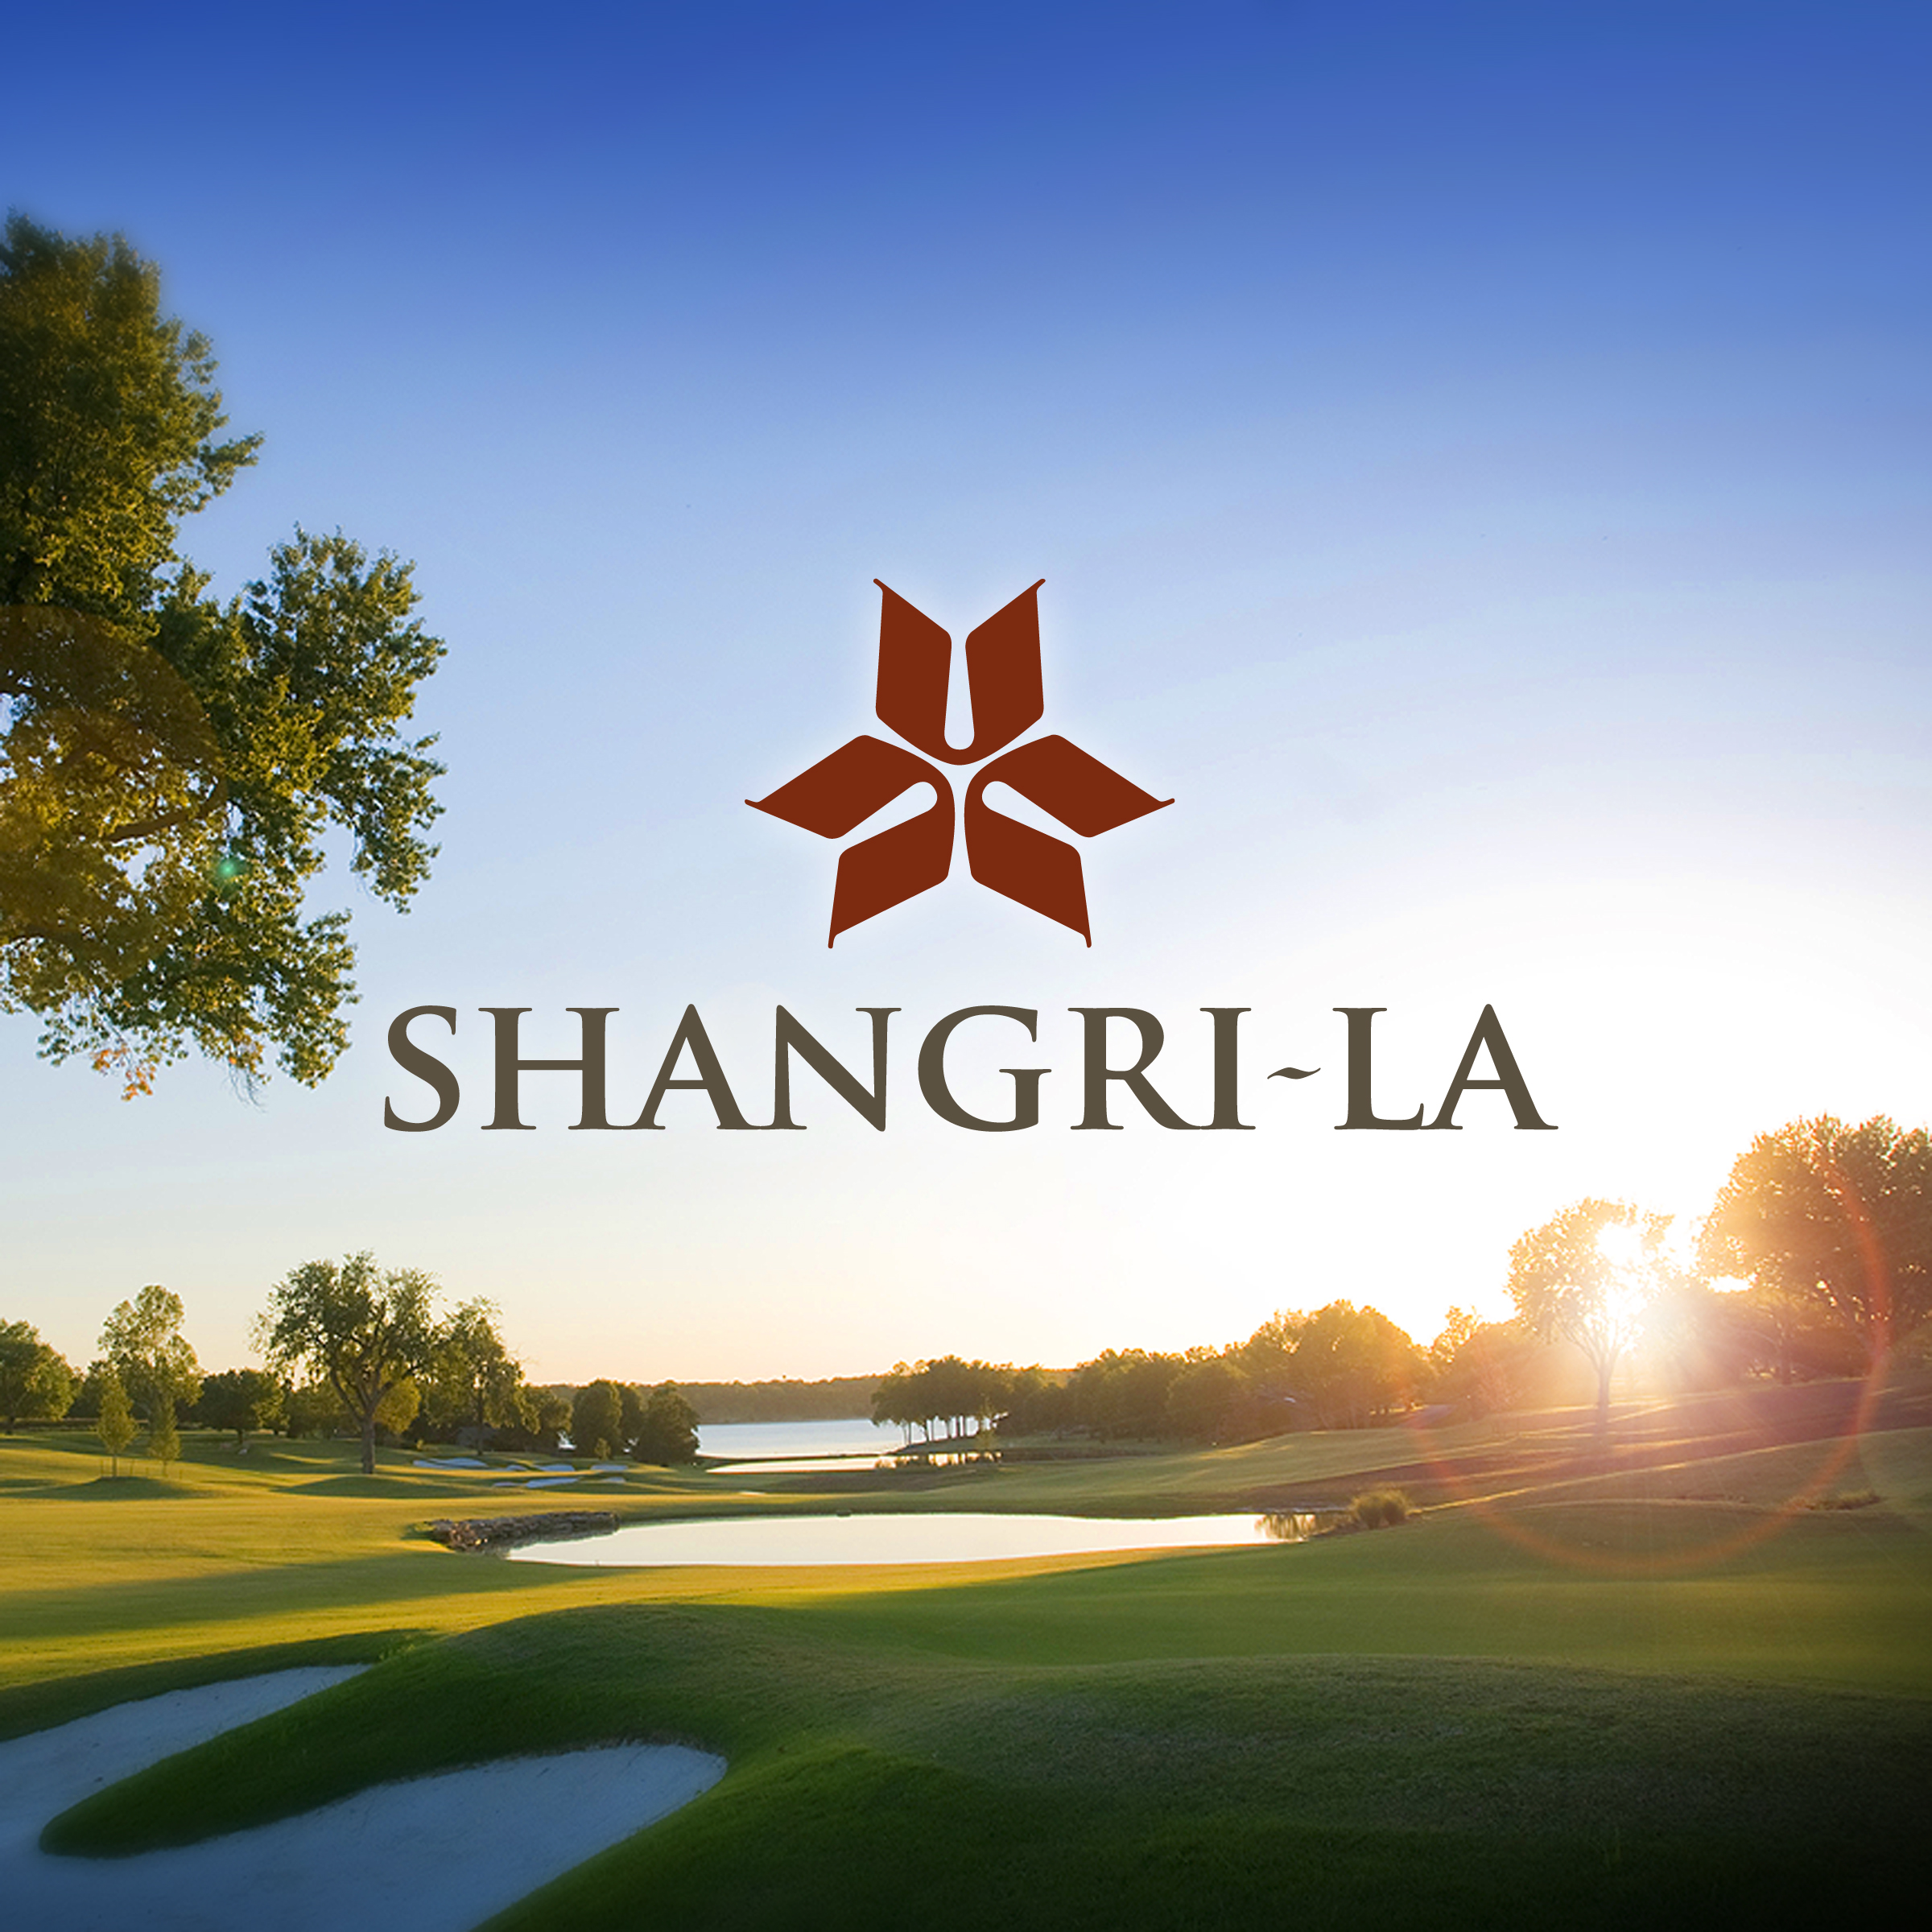 Shangri-La Golf Course